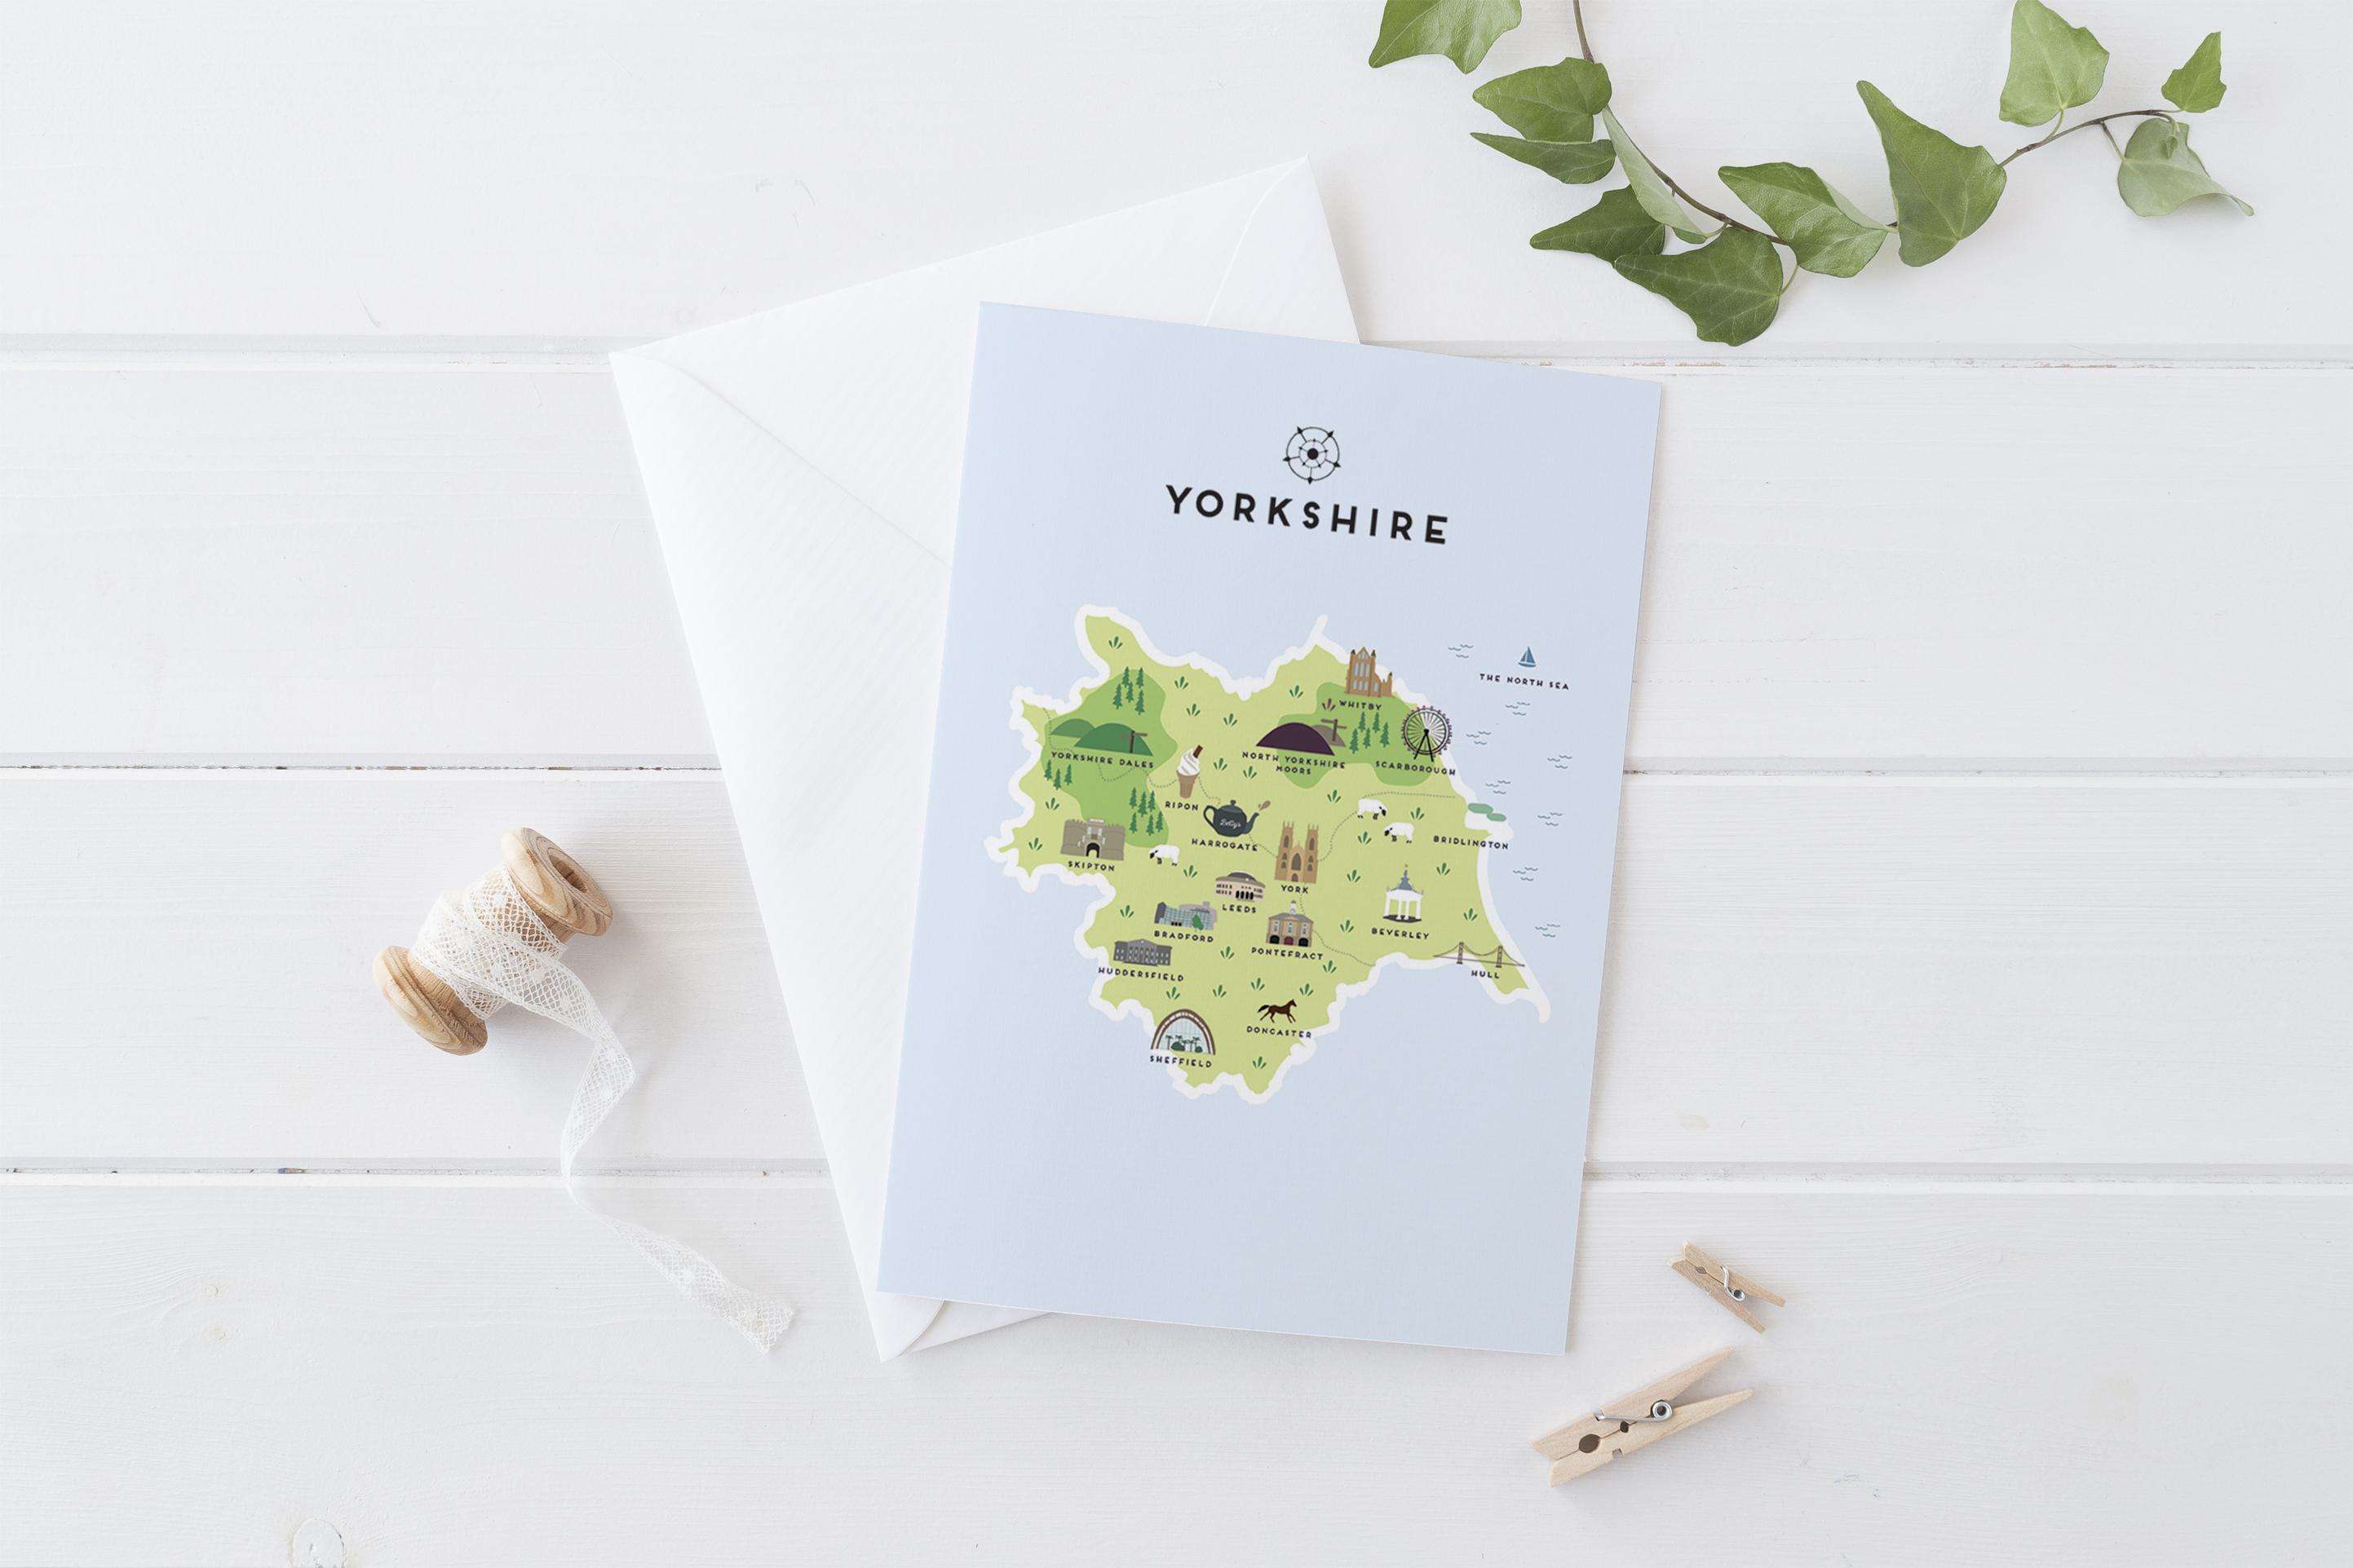 Place in Print Pepper Pot Studios Yorkshire Illustrated Map Art Print Greetings Card